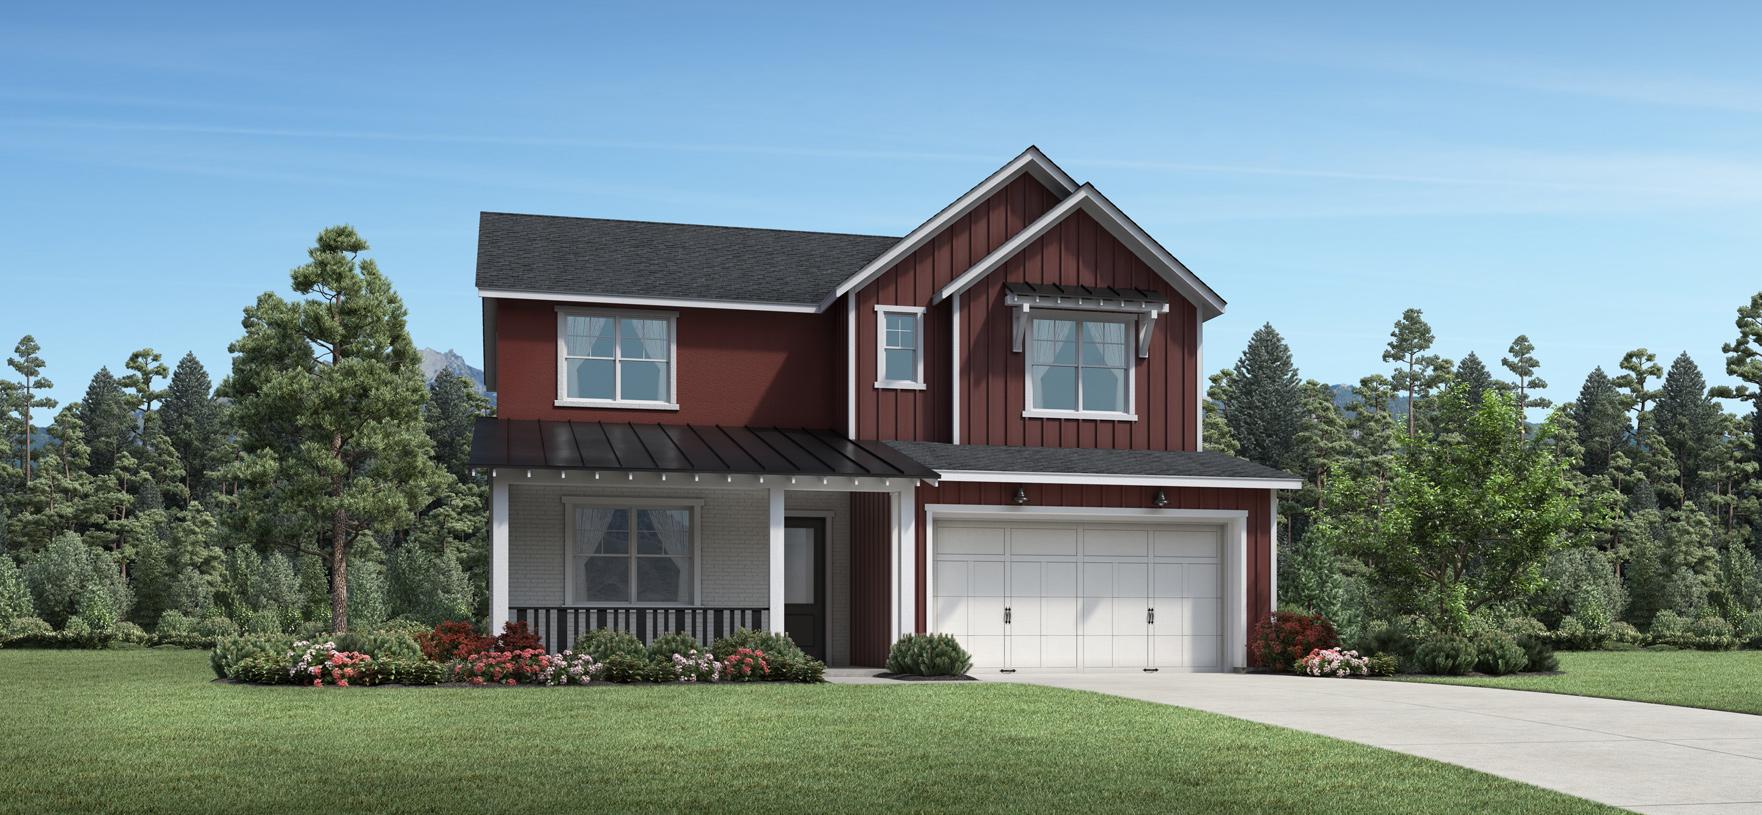 Rockport -  Modern Farmhouse